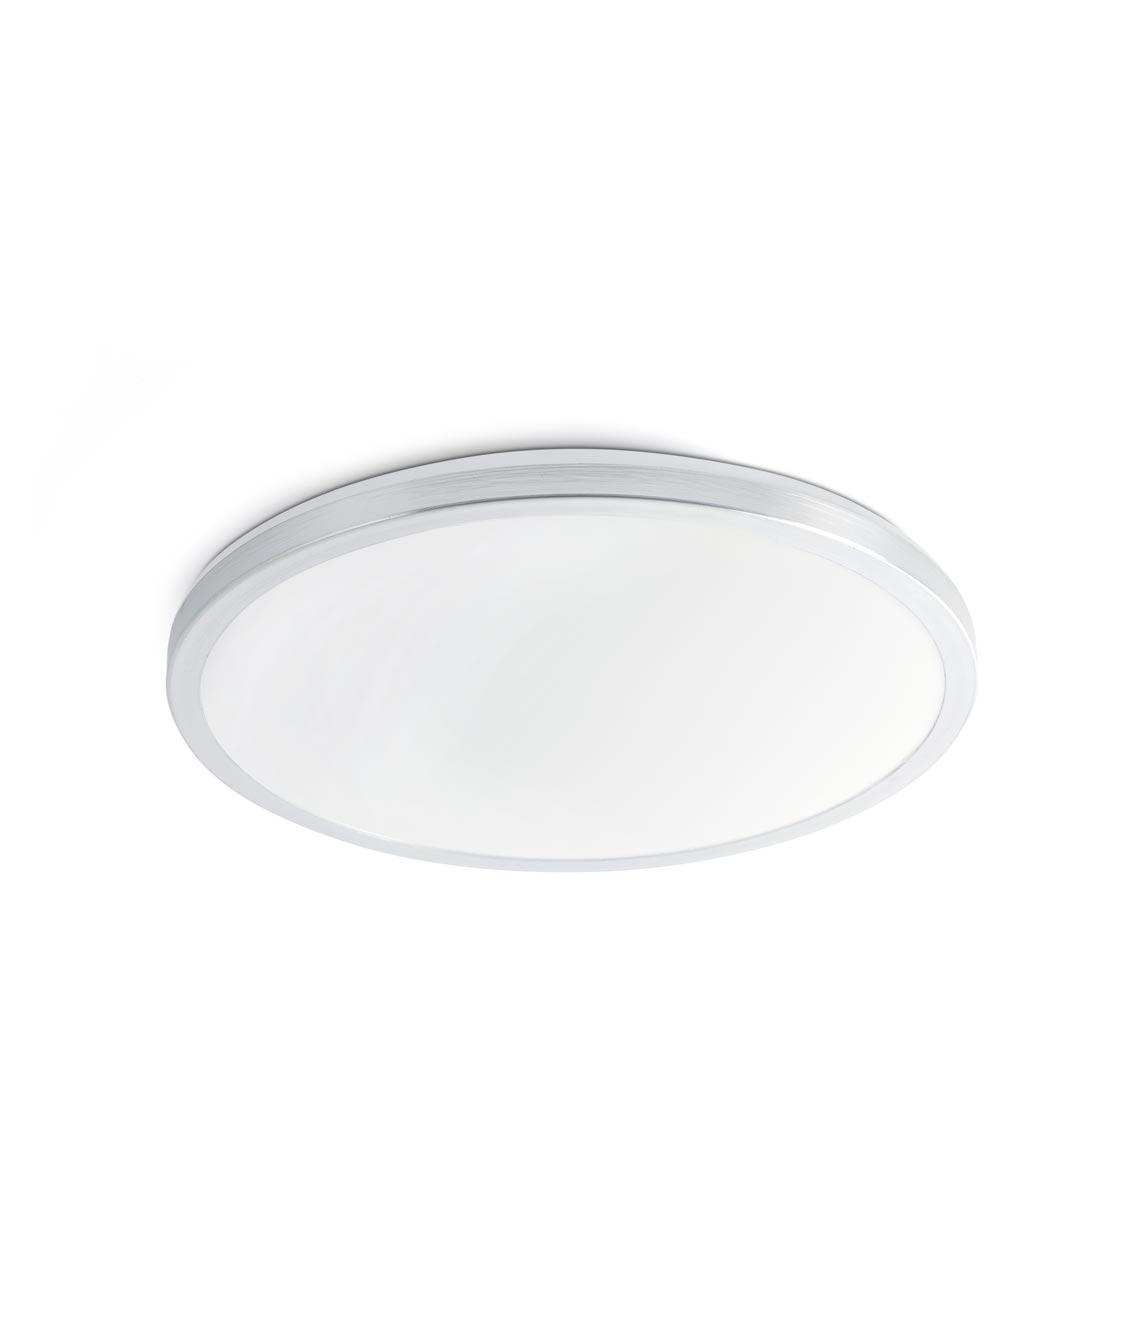 Plafón LED aluminio FORO